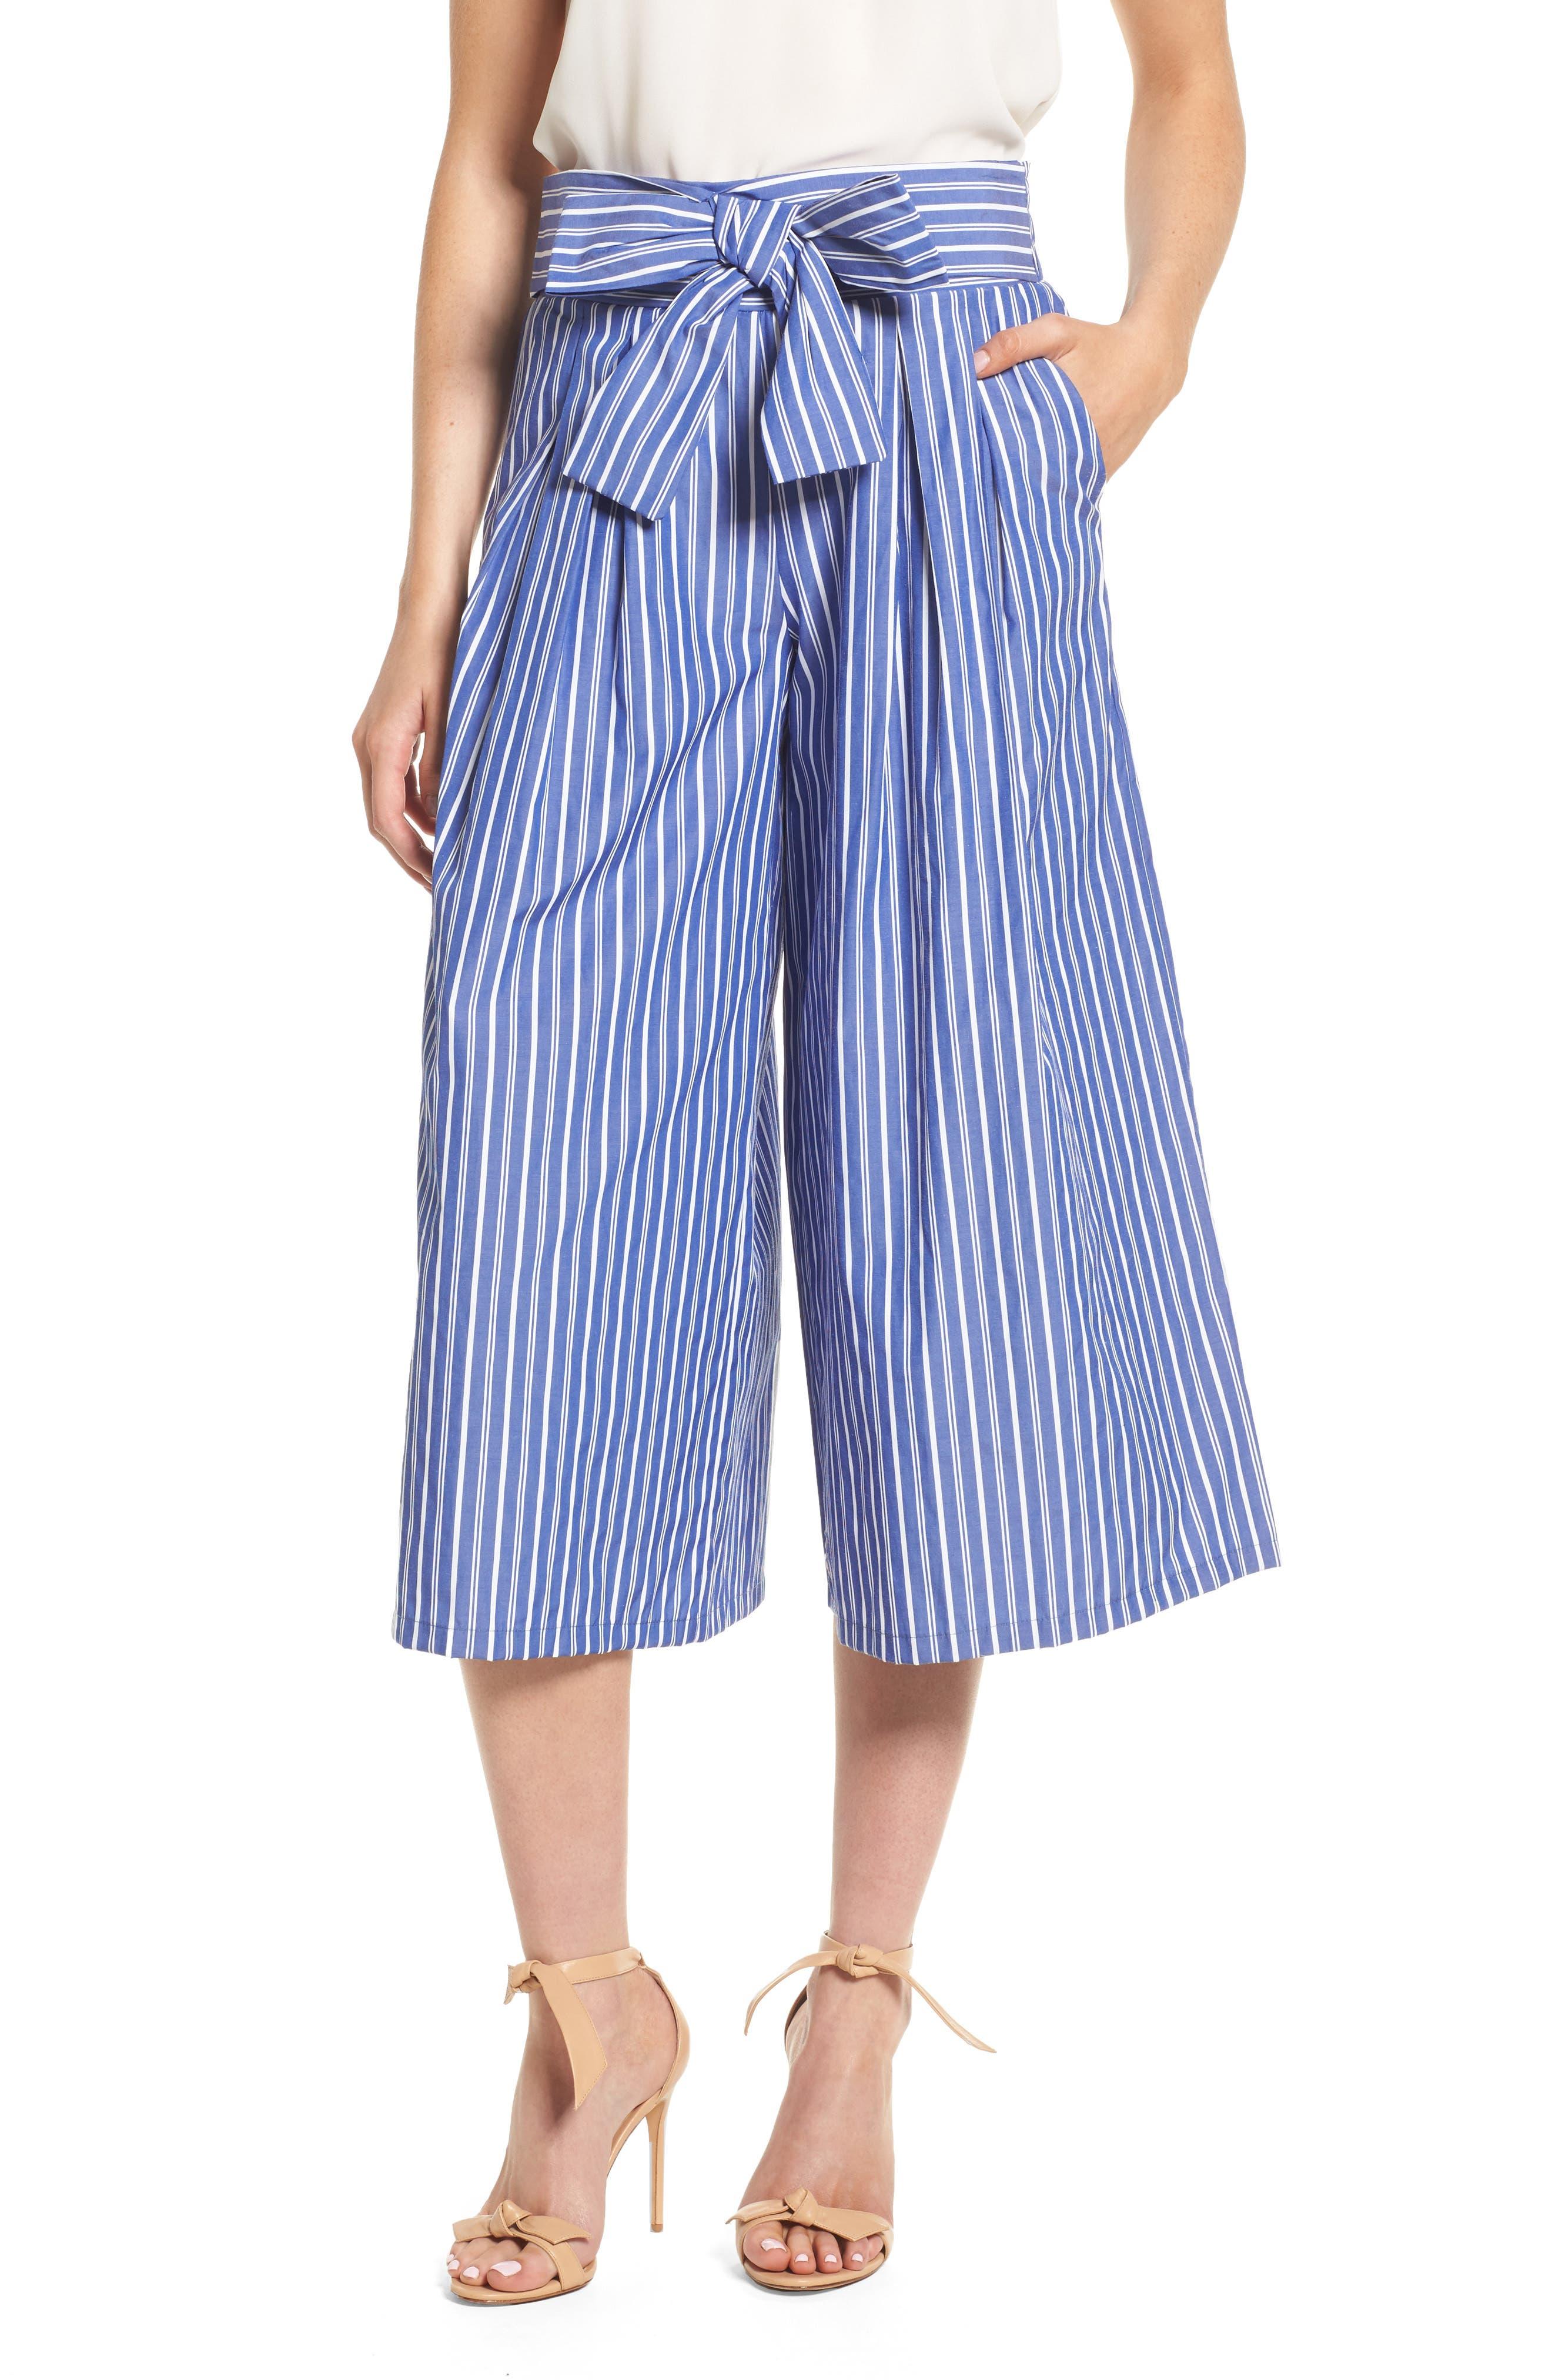 Zadeh Pants,                         Main,                         color, Blue/ White